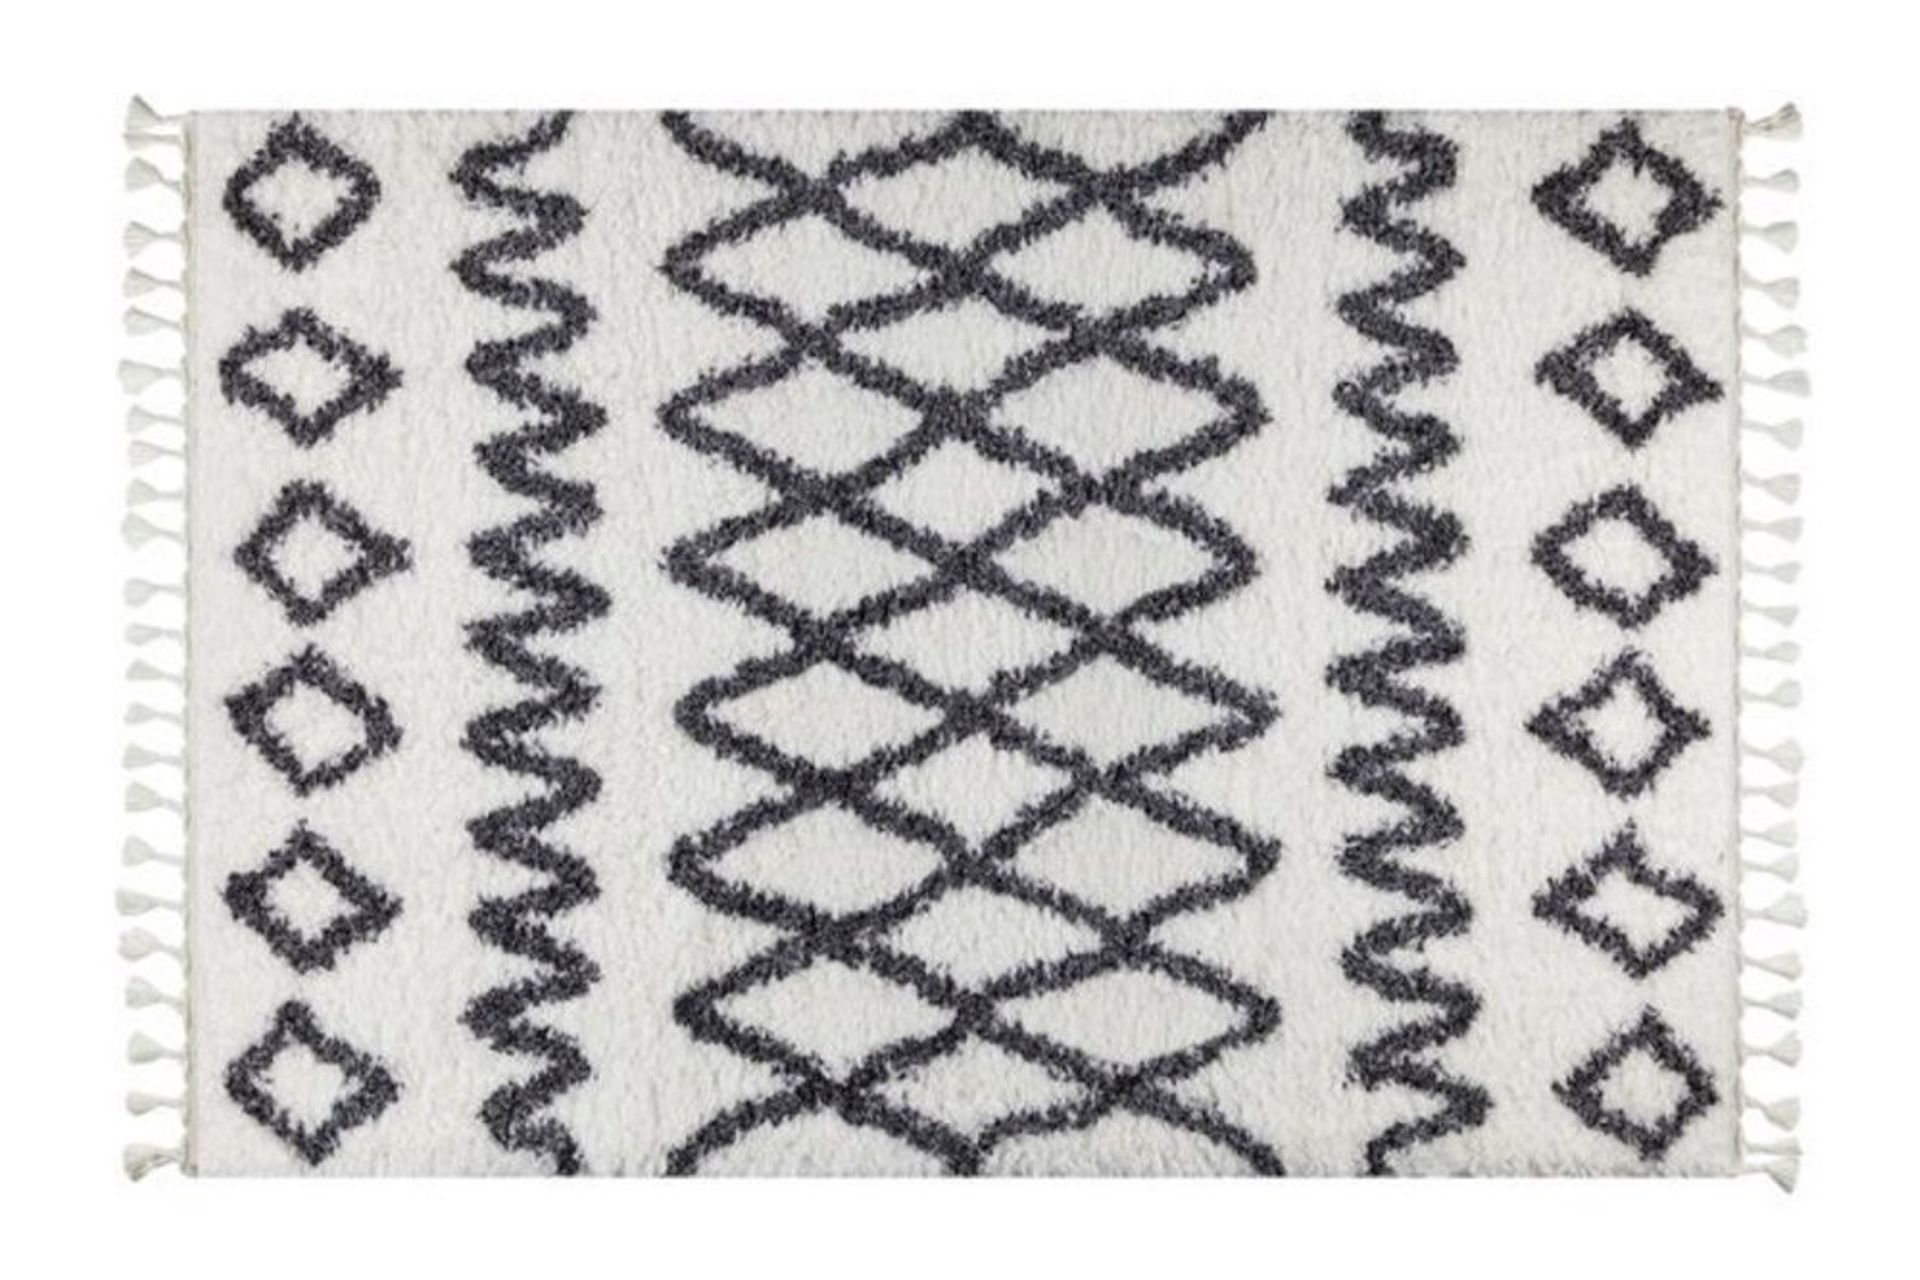 Marrakesh Pattern Rug, White & Anthracite Grey (Medium)